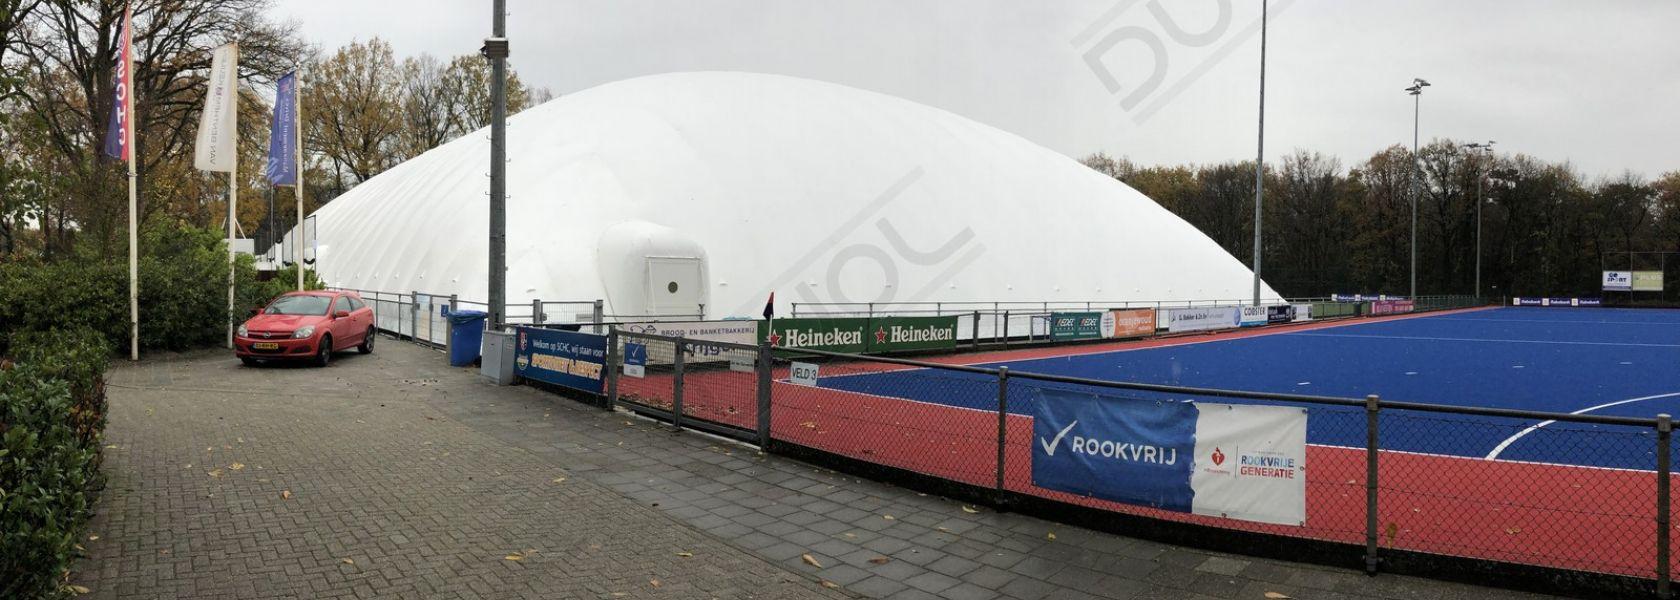 SCHC Bilthoven